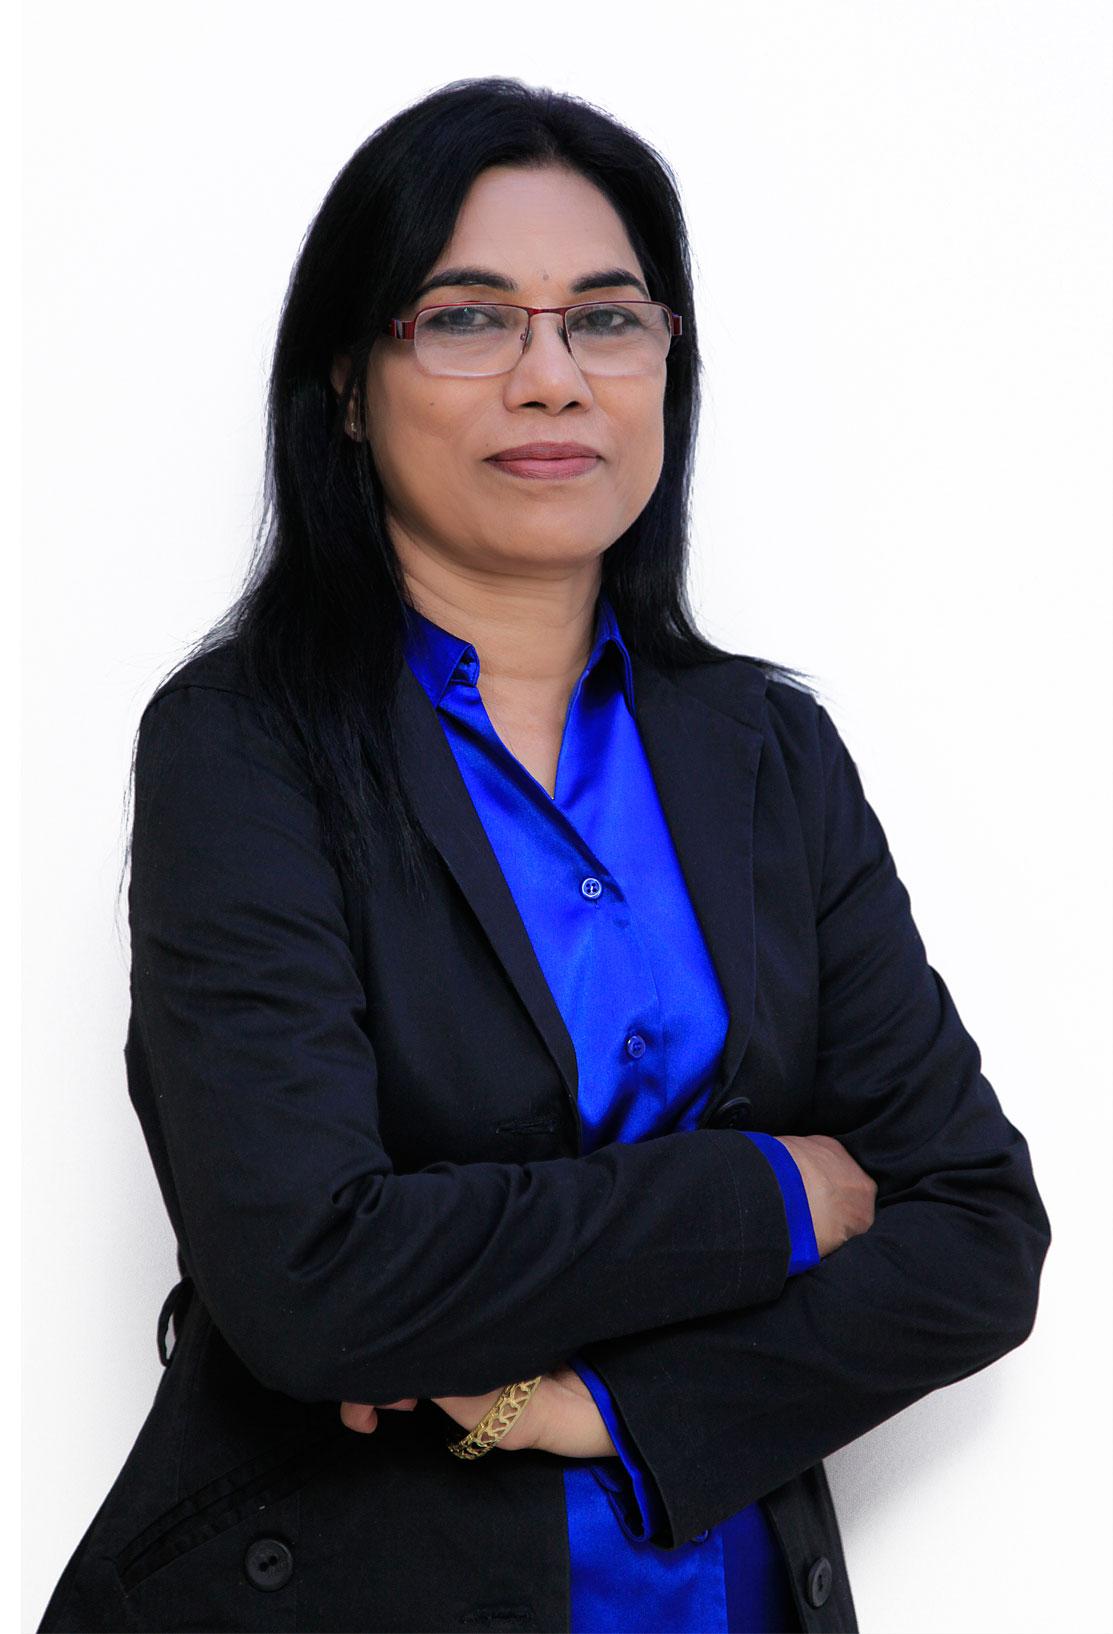 https://mgmmedical.ae/wp-content/uploads/2018/04/Dr-Usha-Rani.jpg